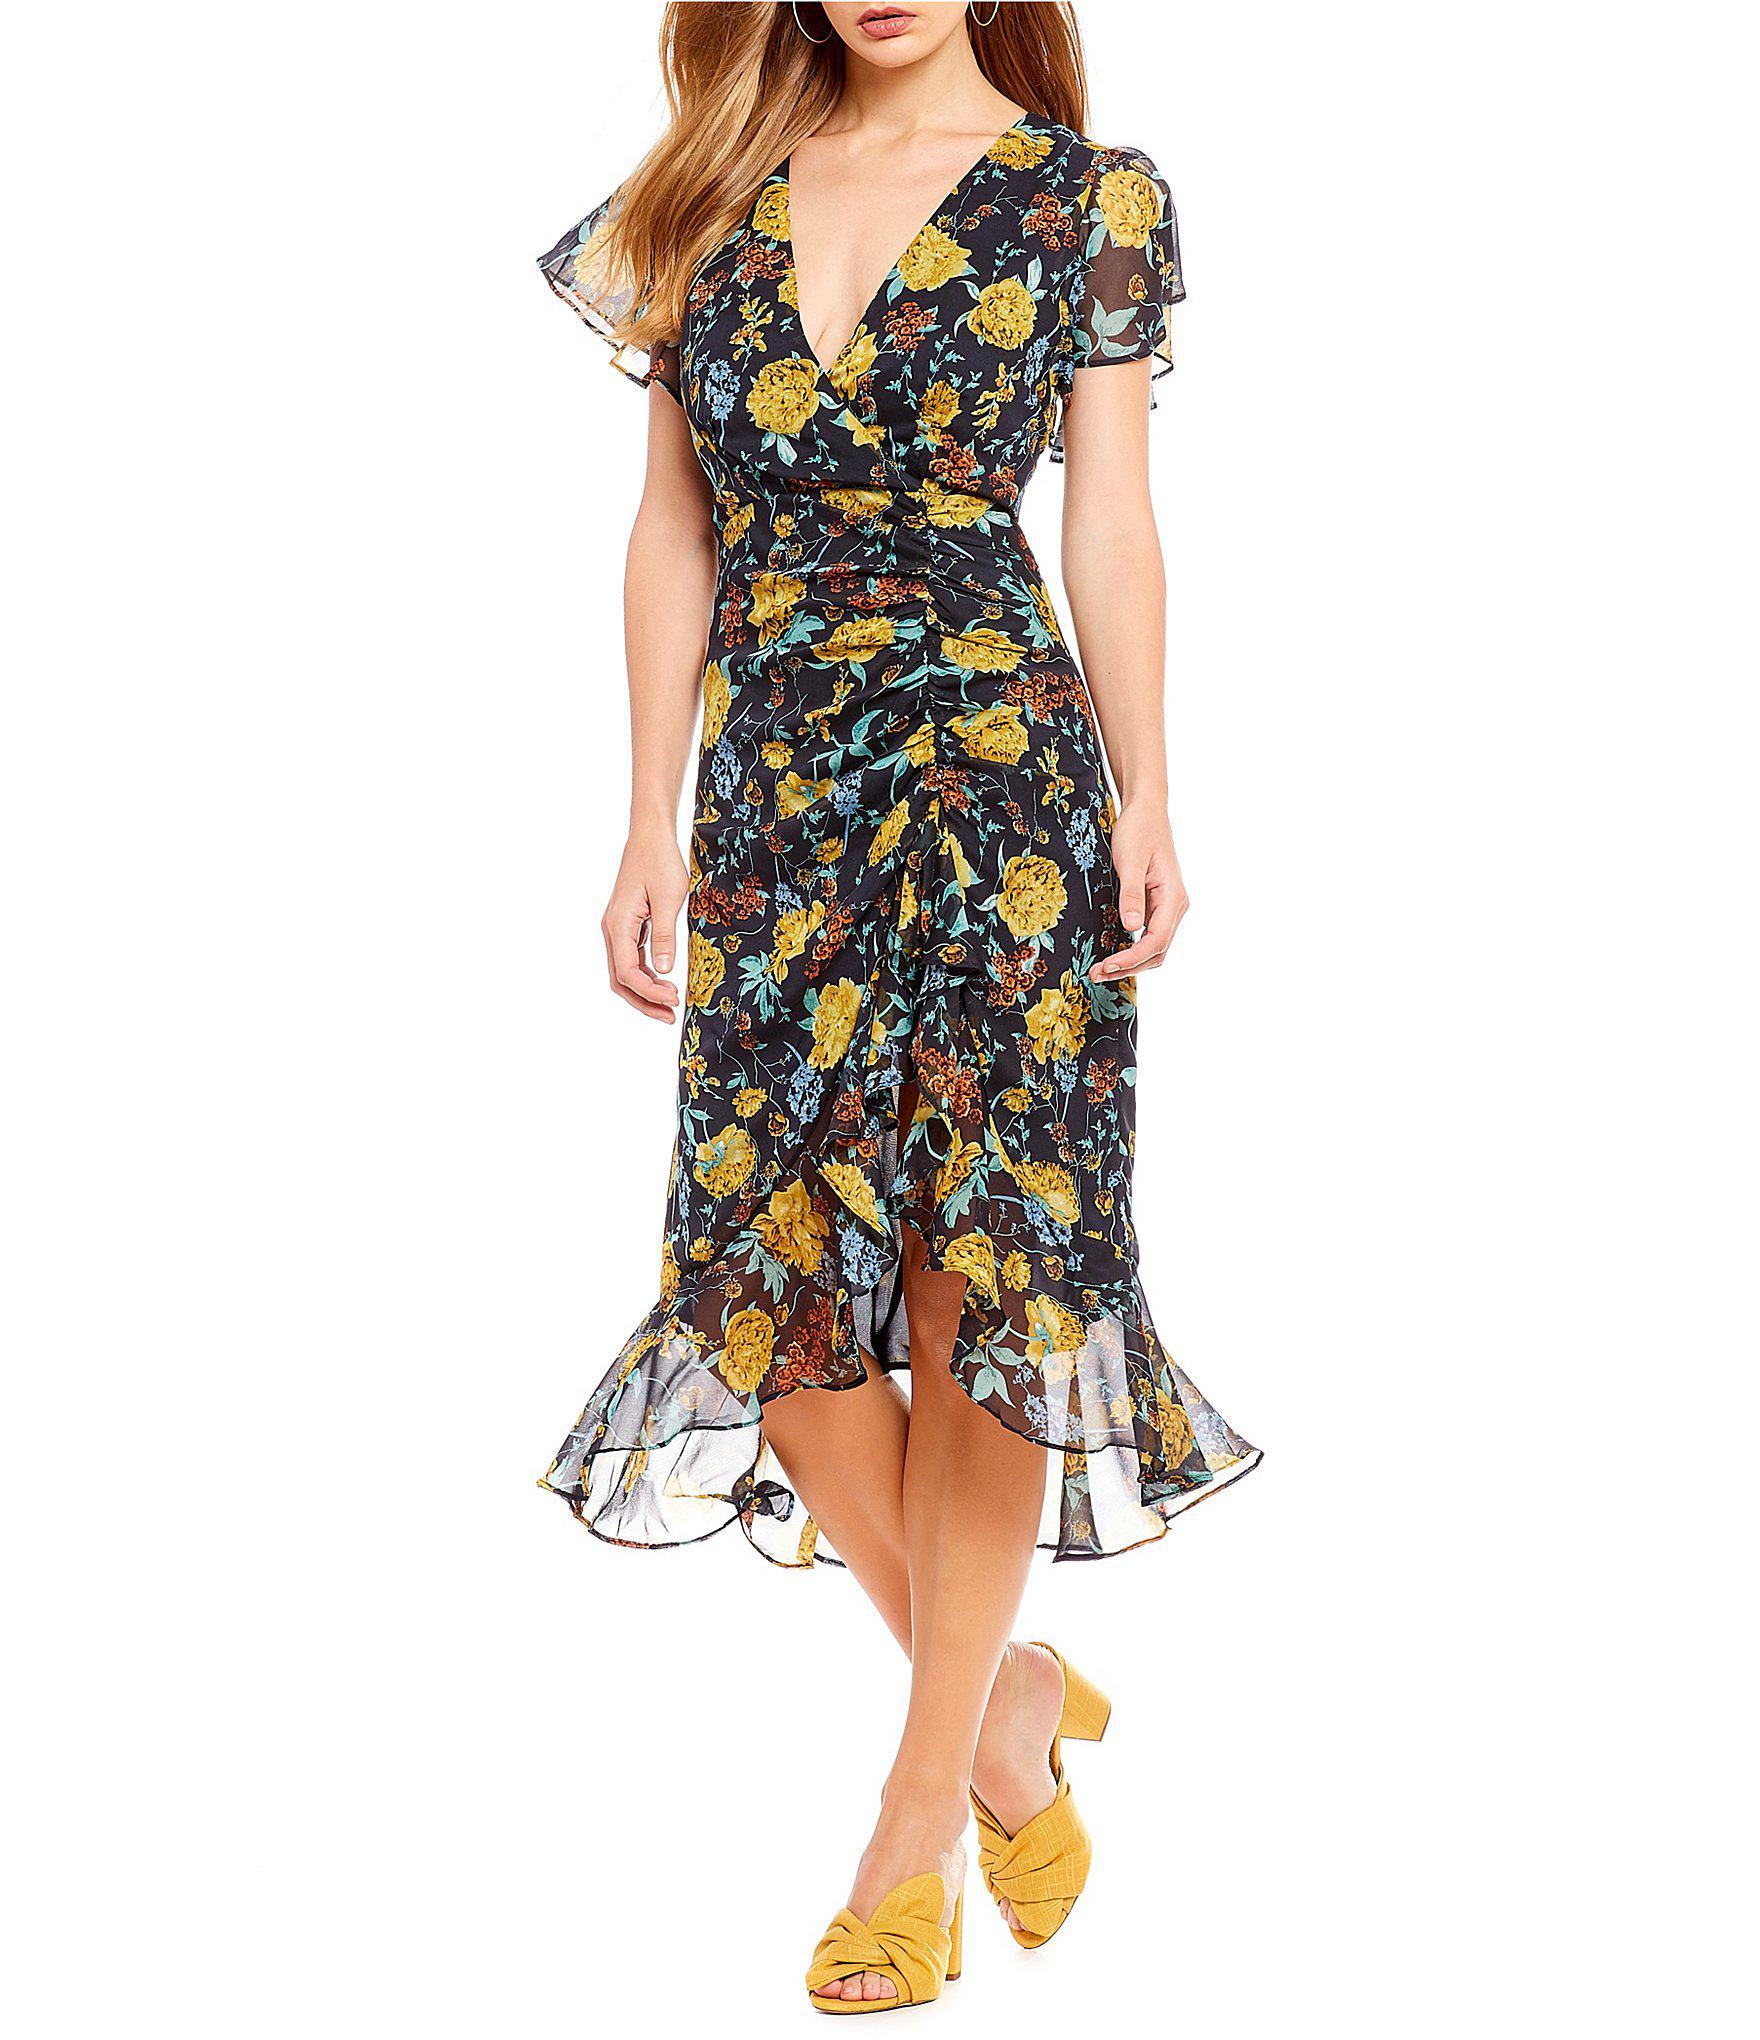 d46fffbc5e Lucy Paris Isabella Ruched Floral Print Ruffle Hem Midi Dress in ...